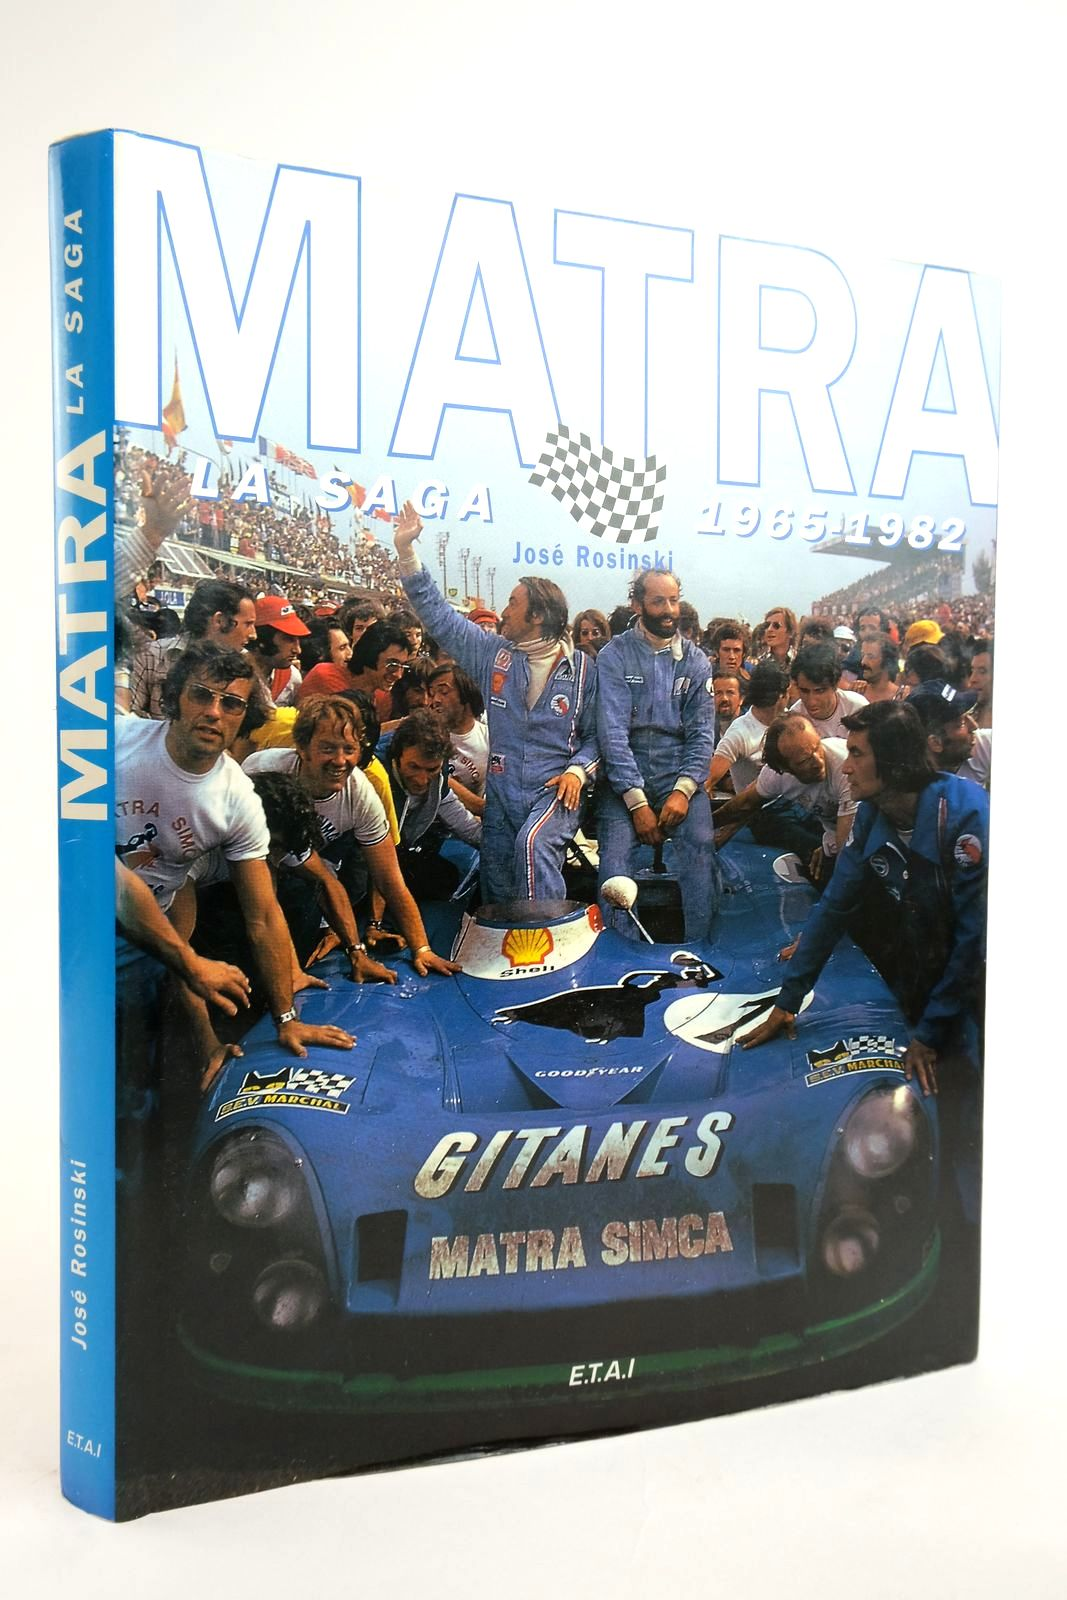 Photo of MATRA LA SAGA 1965-1982 written by Rosinski, Jose published by E.T.A.I. (STOCK CODE: 2135001)  for sale by Stella & Rose's Books